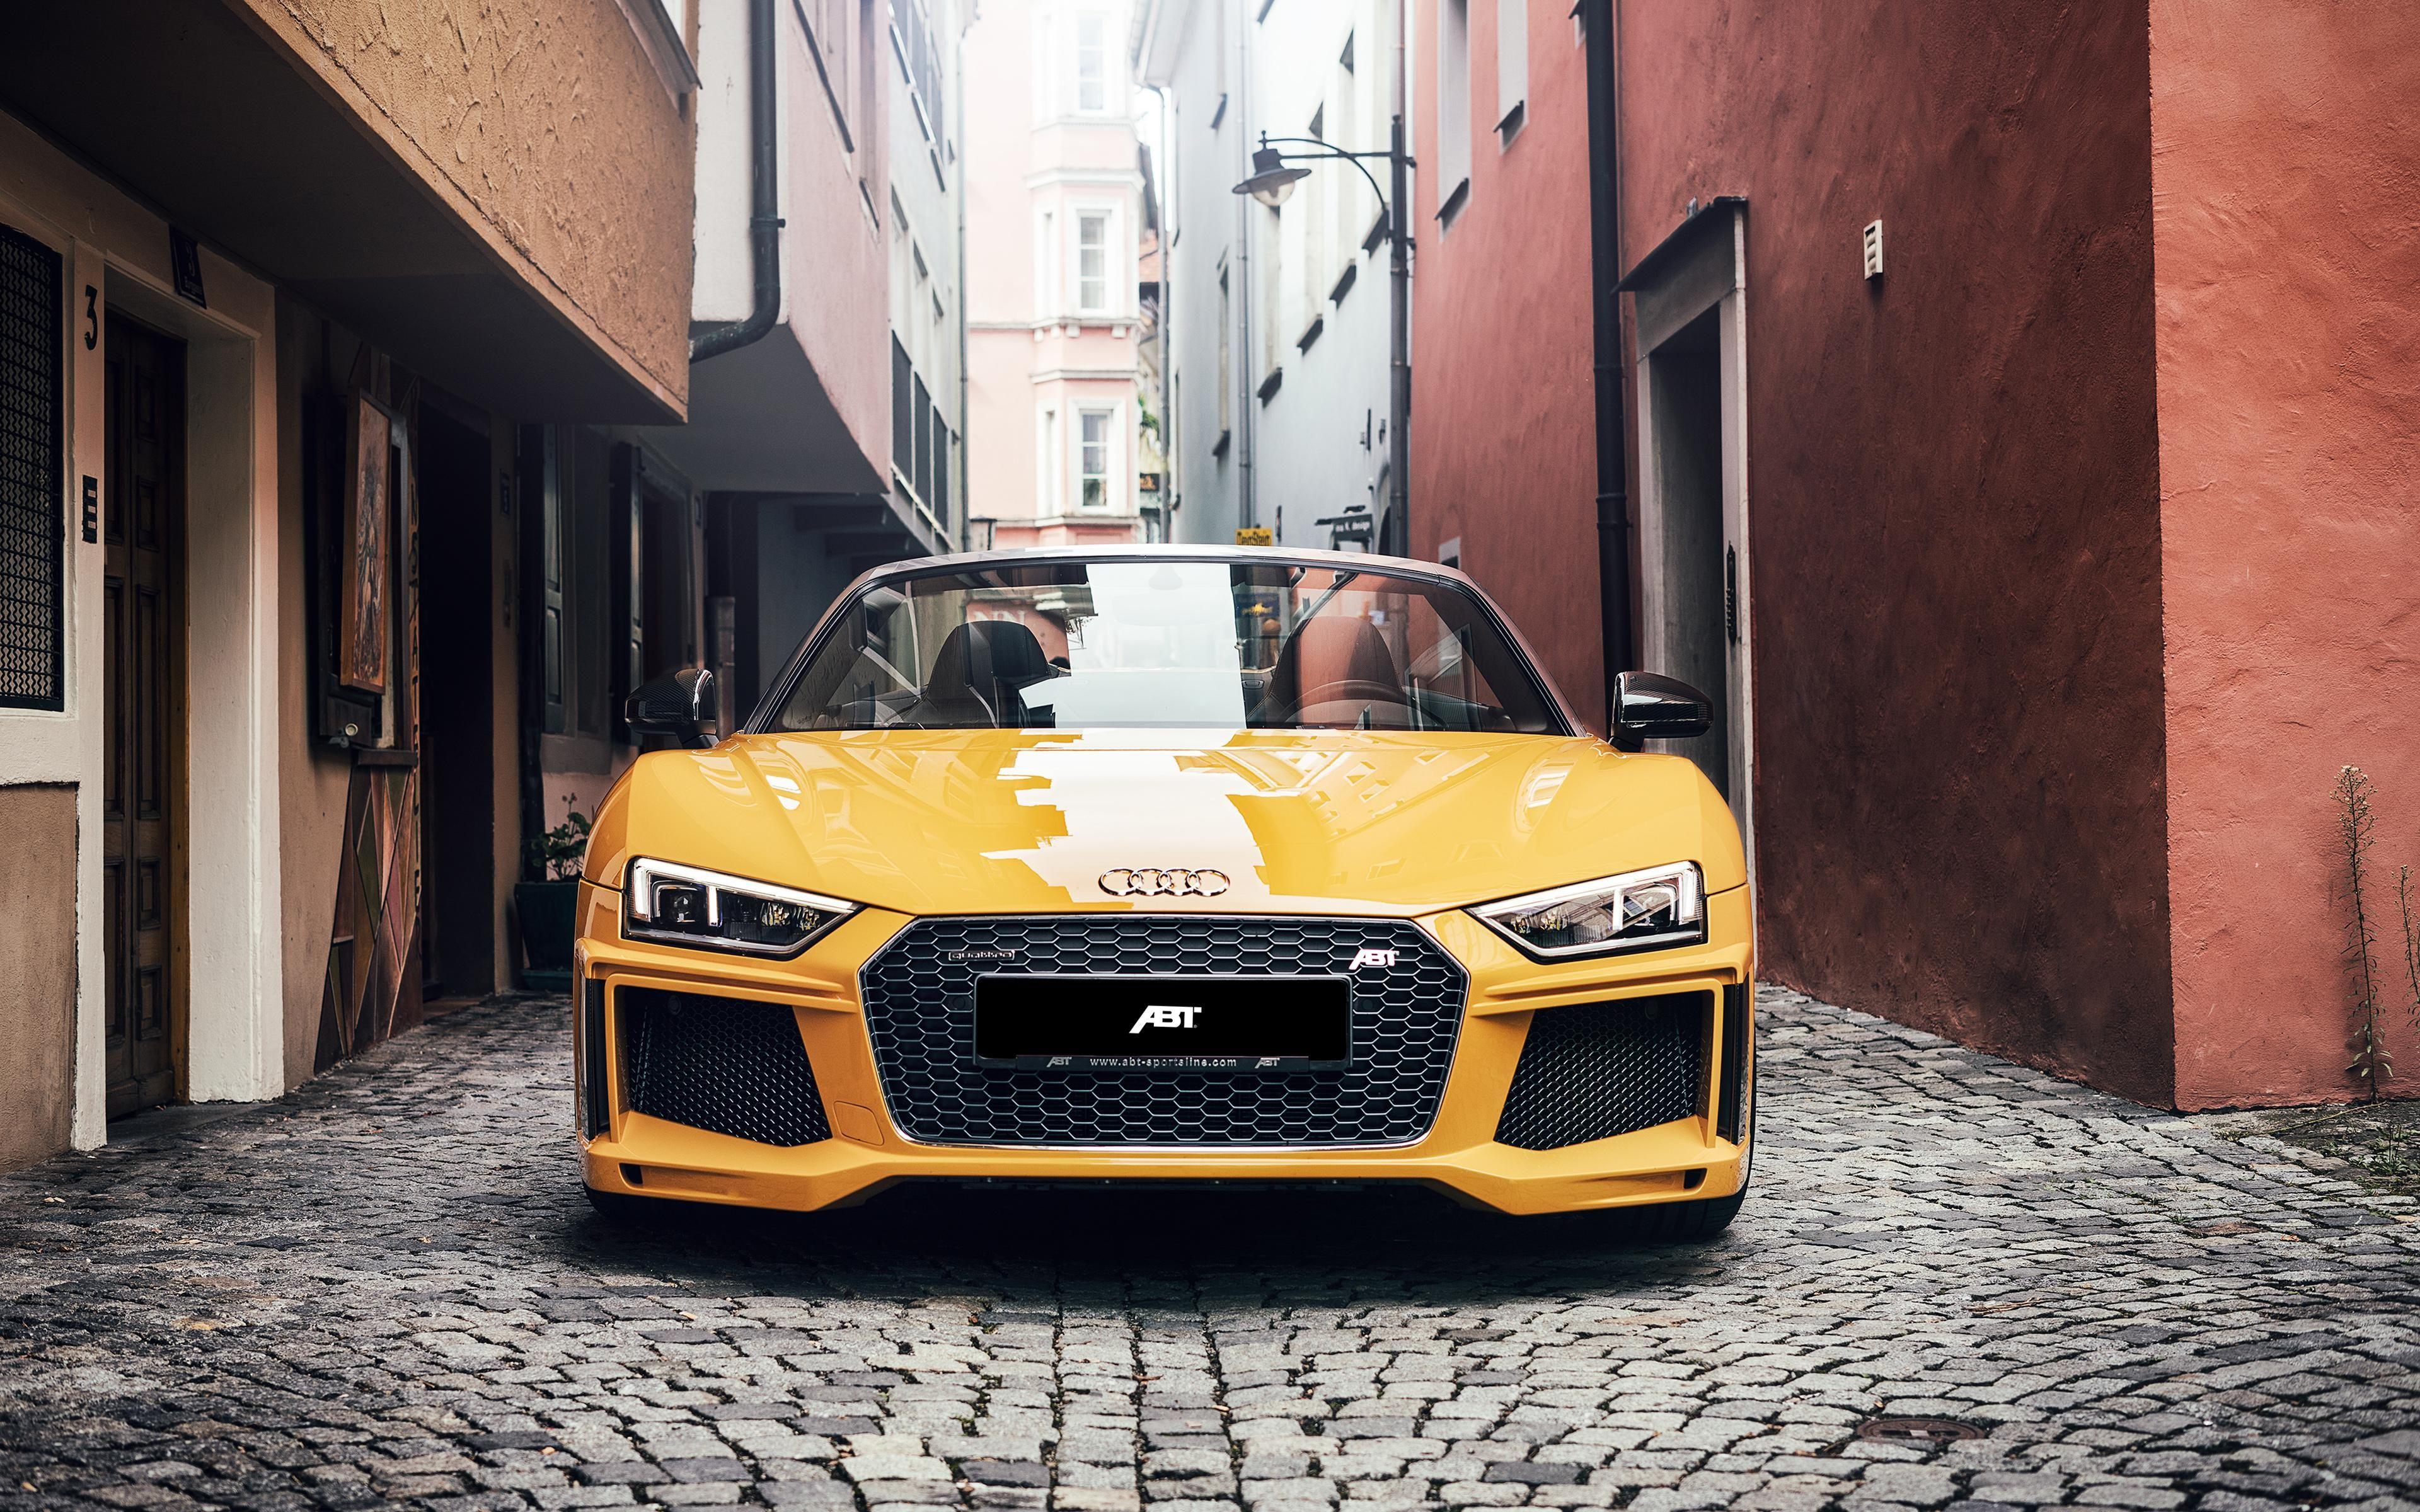 Yellow Audi Audi R8 Spyder Audi R8 Car Wallpapers